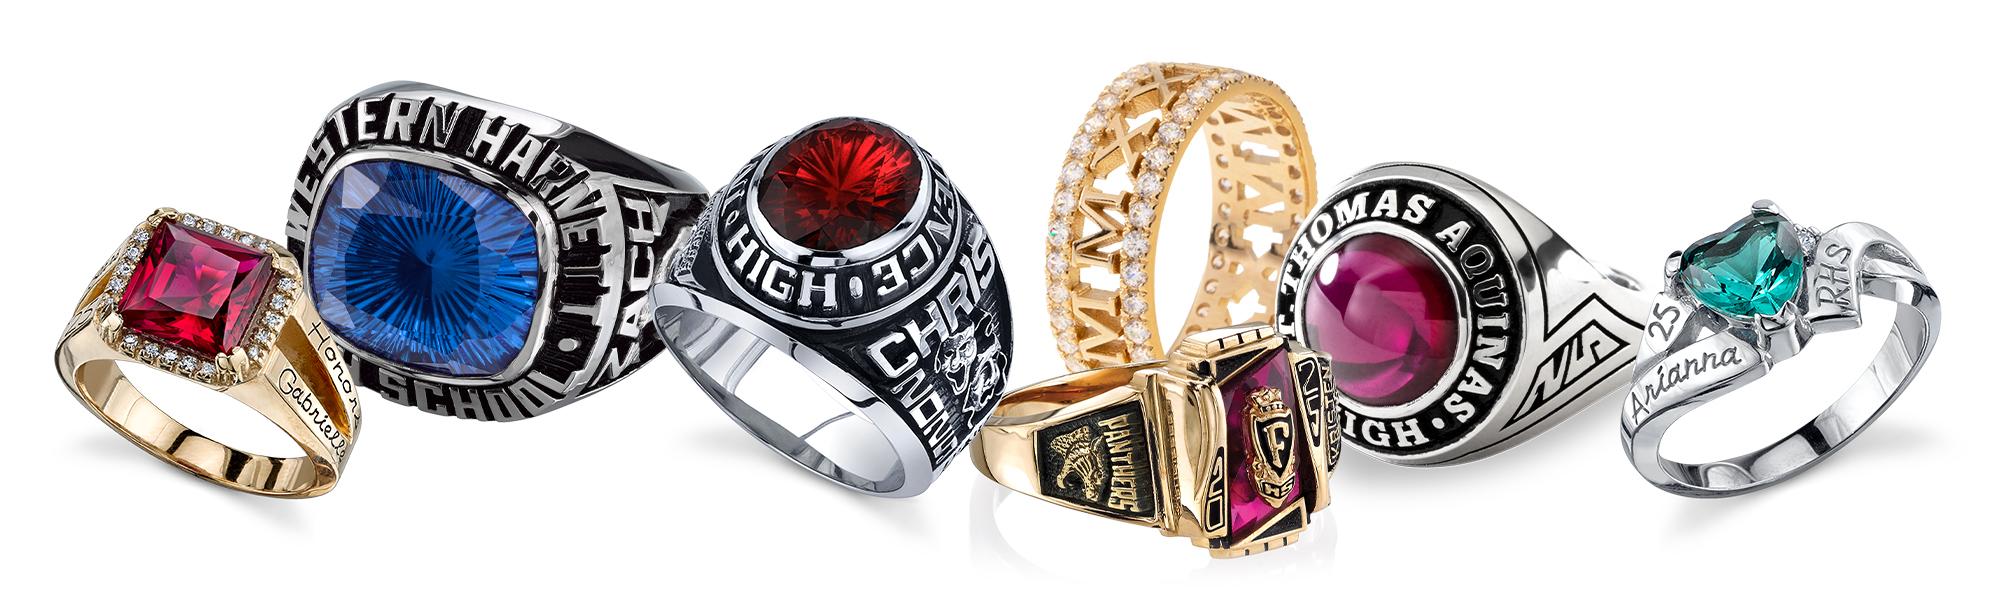 HS Class Jewelry